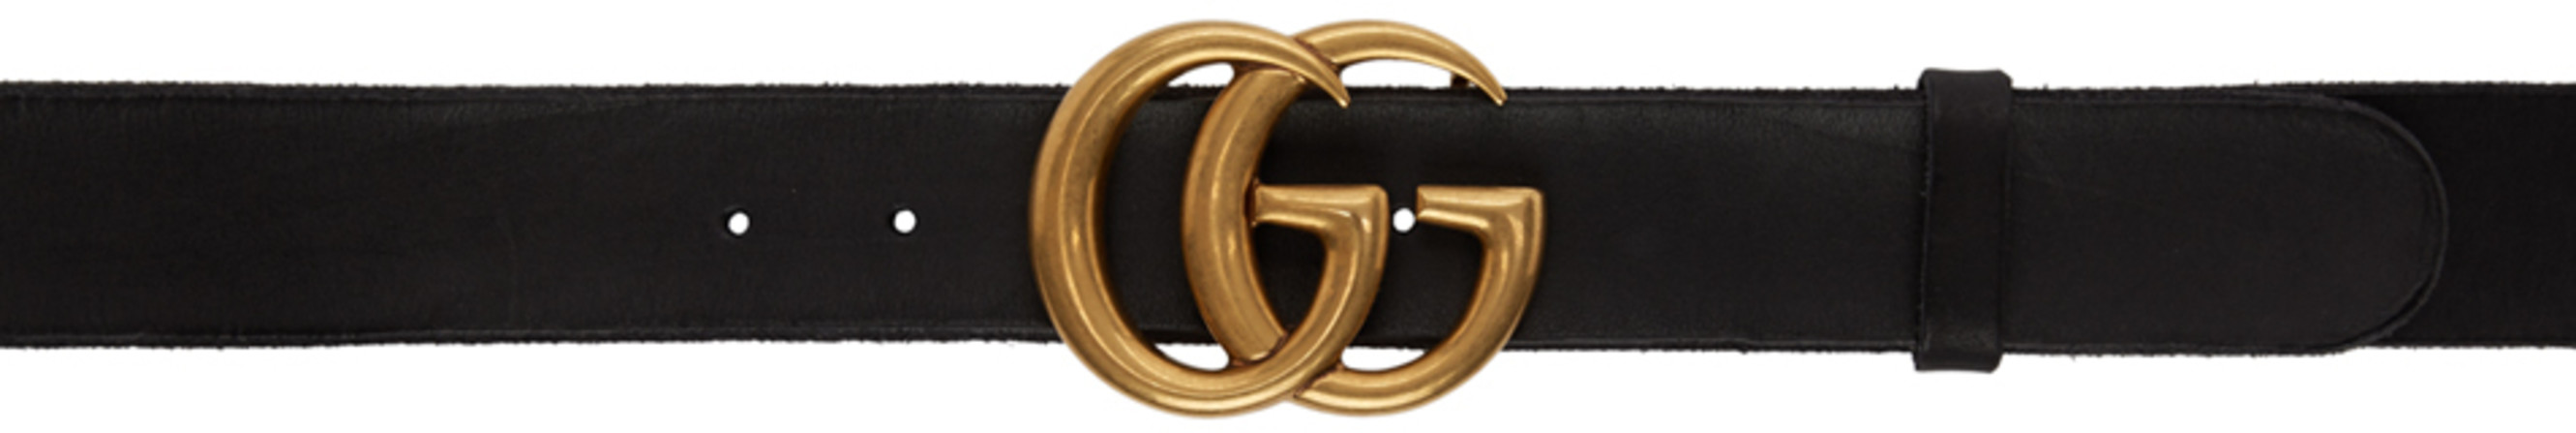 987d25ec4670f Gucci belts   suspenders for Women